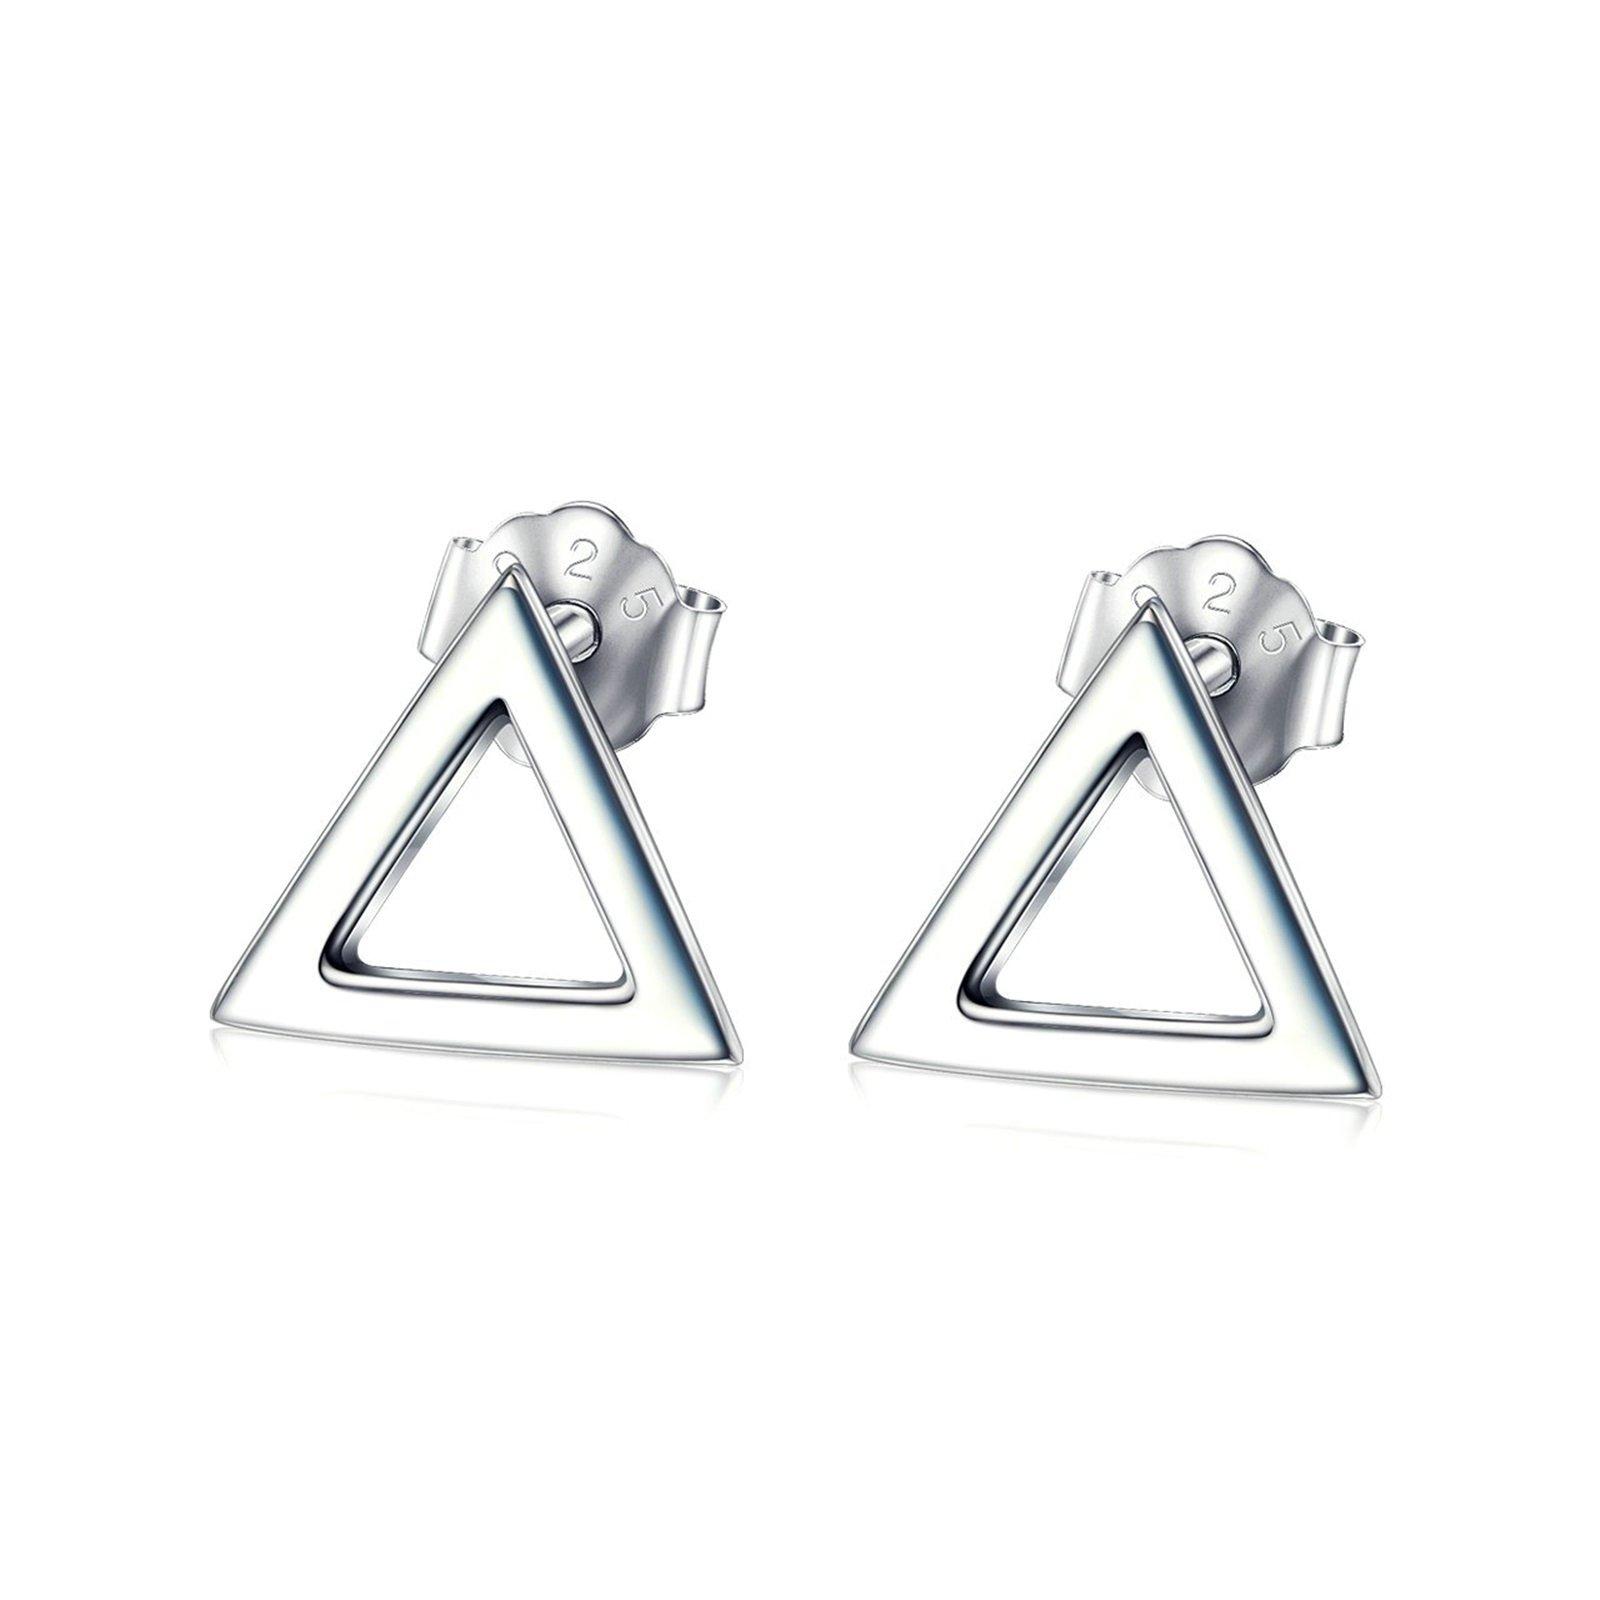 Aooaz Jewelry Silver Plated Simple Charm Men and Women Men Trigon Stud Earrings